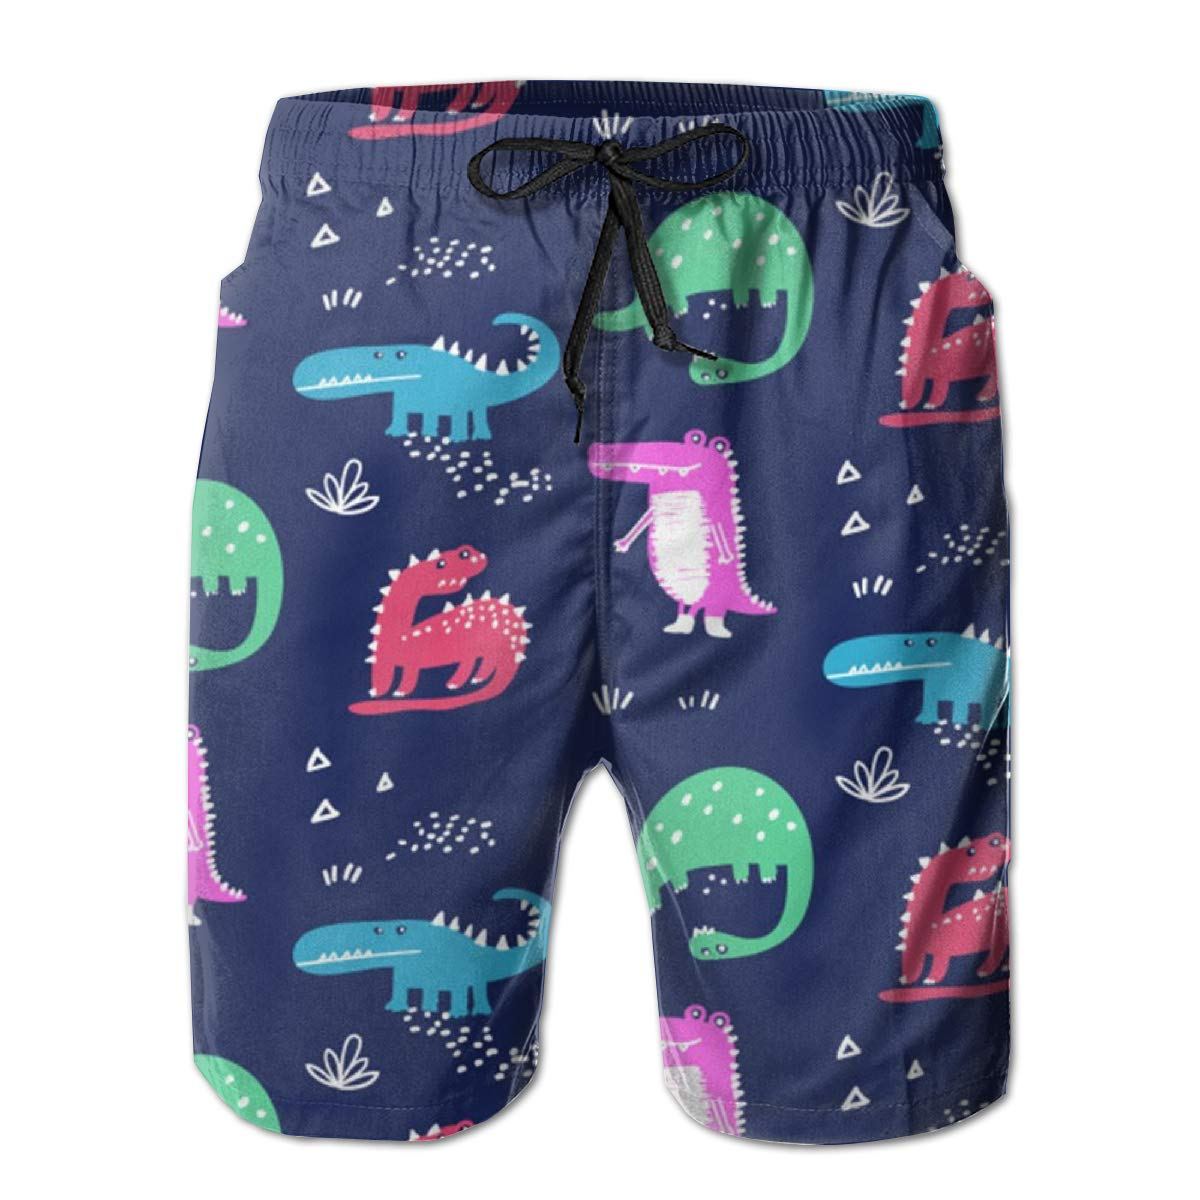 Cartoon Animals Mens Summer Beachwear Sports Running Swim Board Shorts Mesh Lining